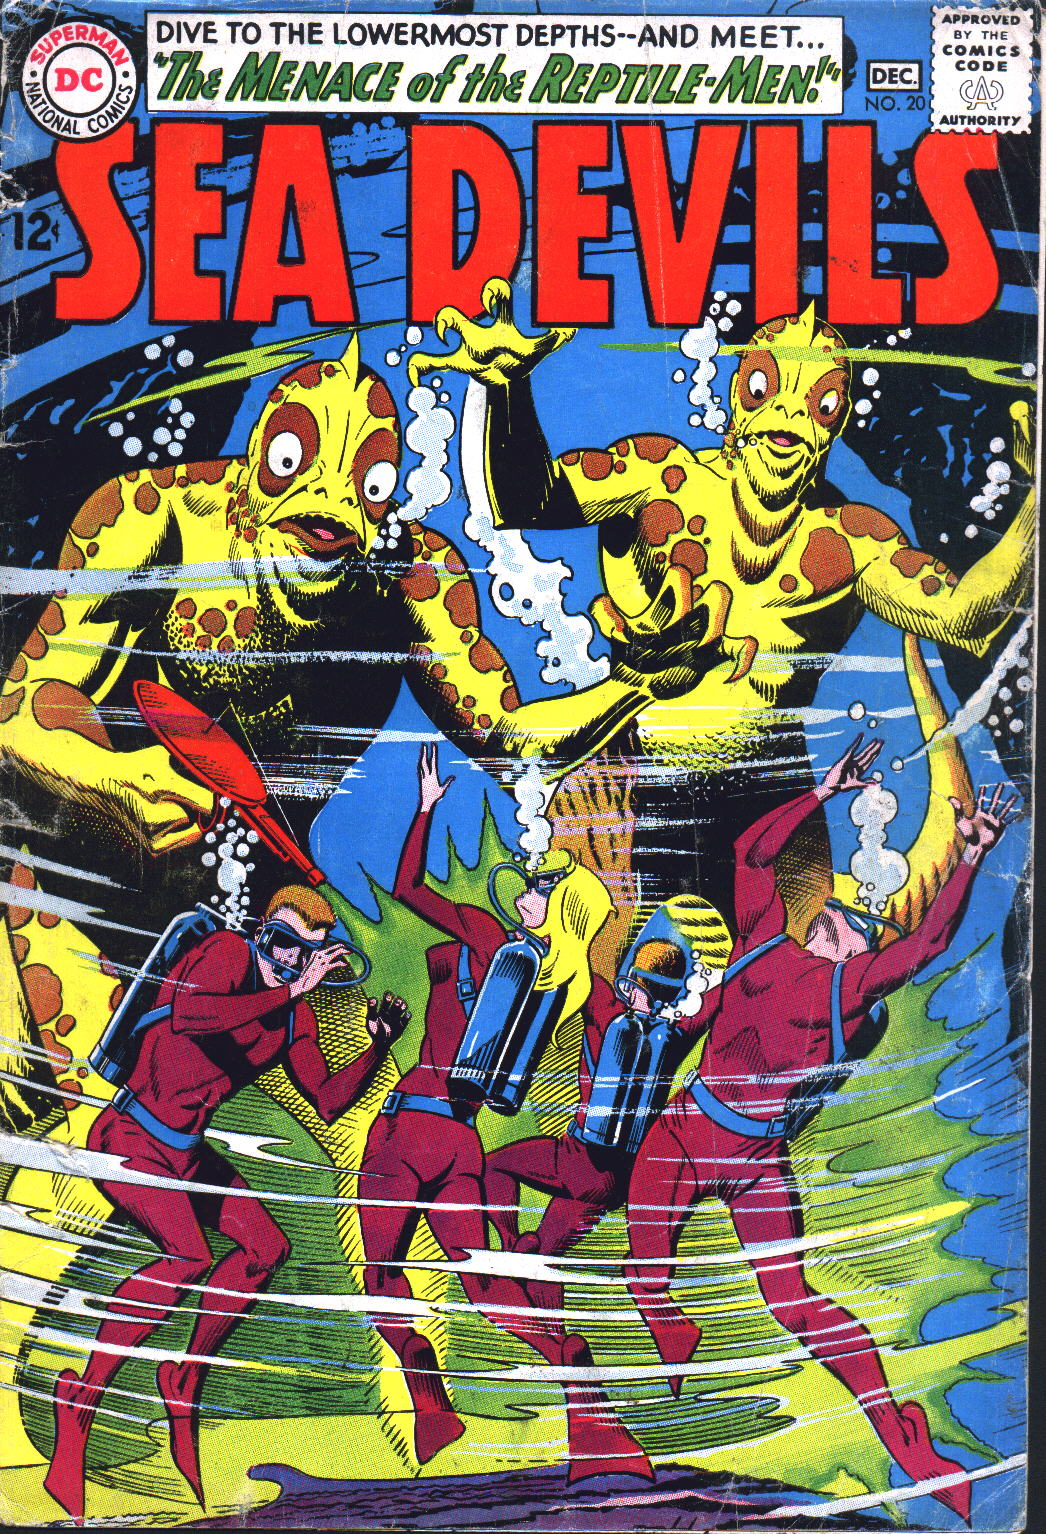 Read online Sea Devils comic -  Issue #20 - 1